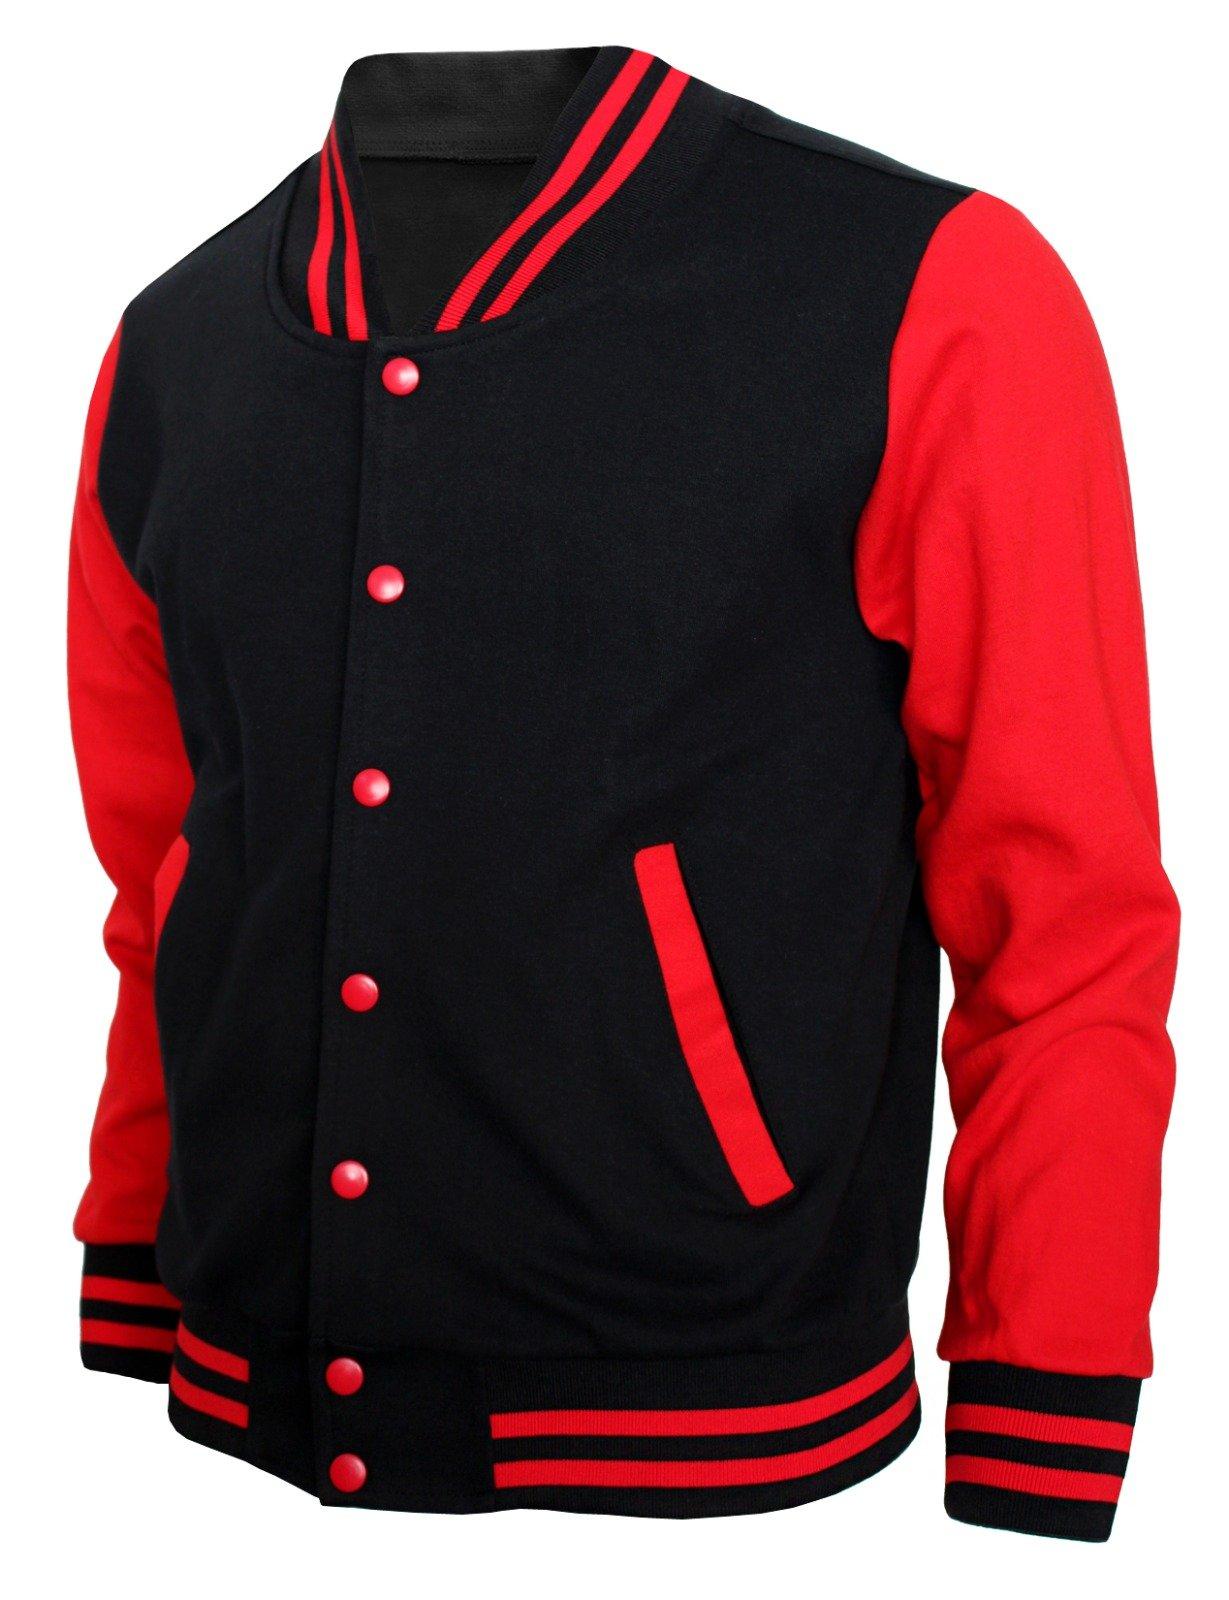 Bcpolo Baseball Jacket Varsity Baseball Cotton Jacket Letterman jacket 8 Colors-B-R M